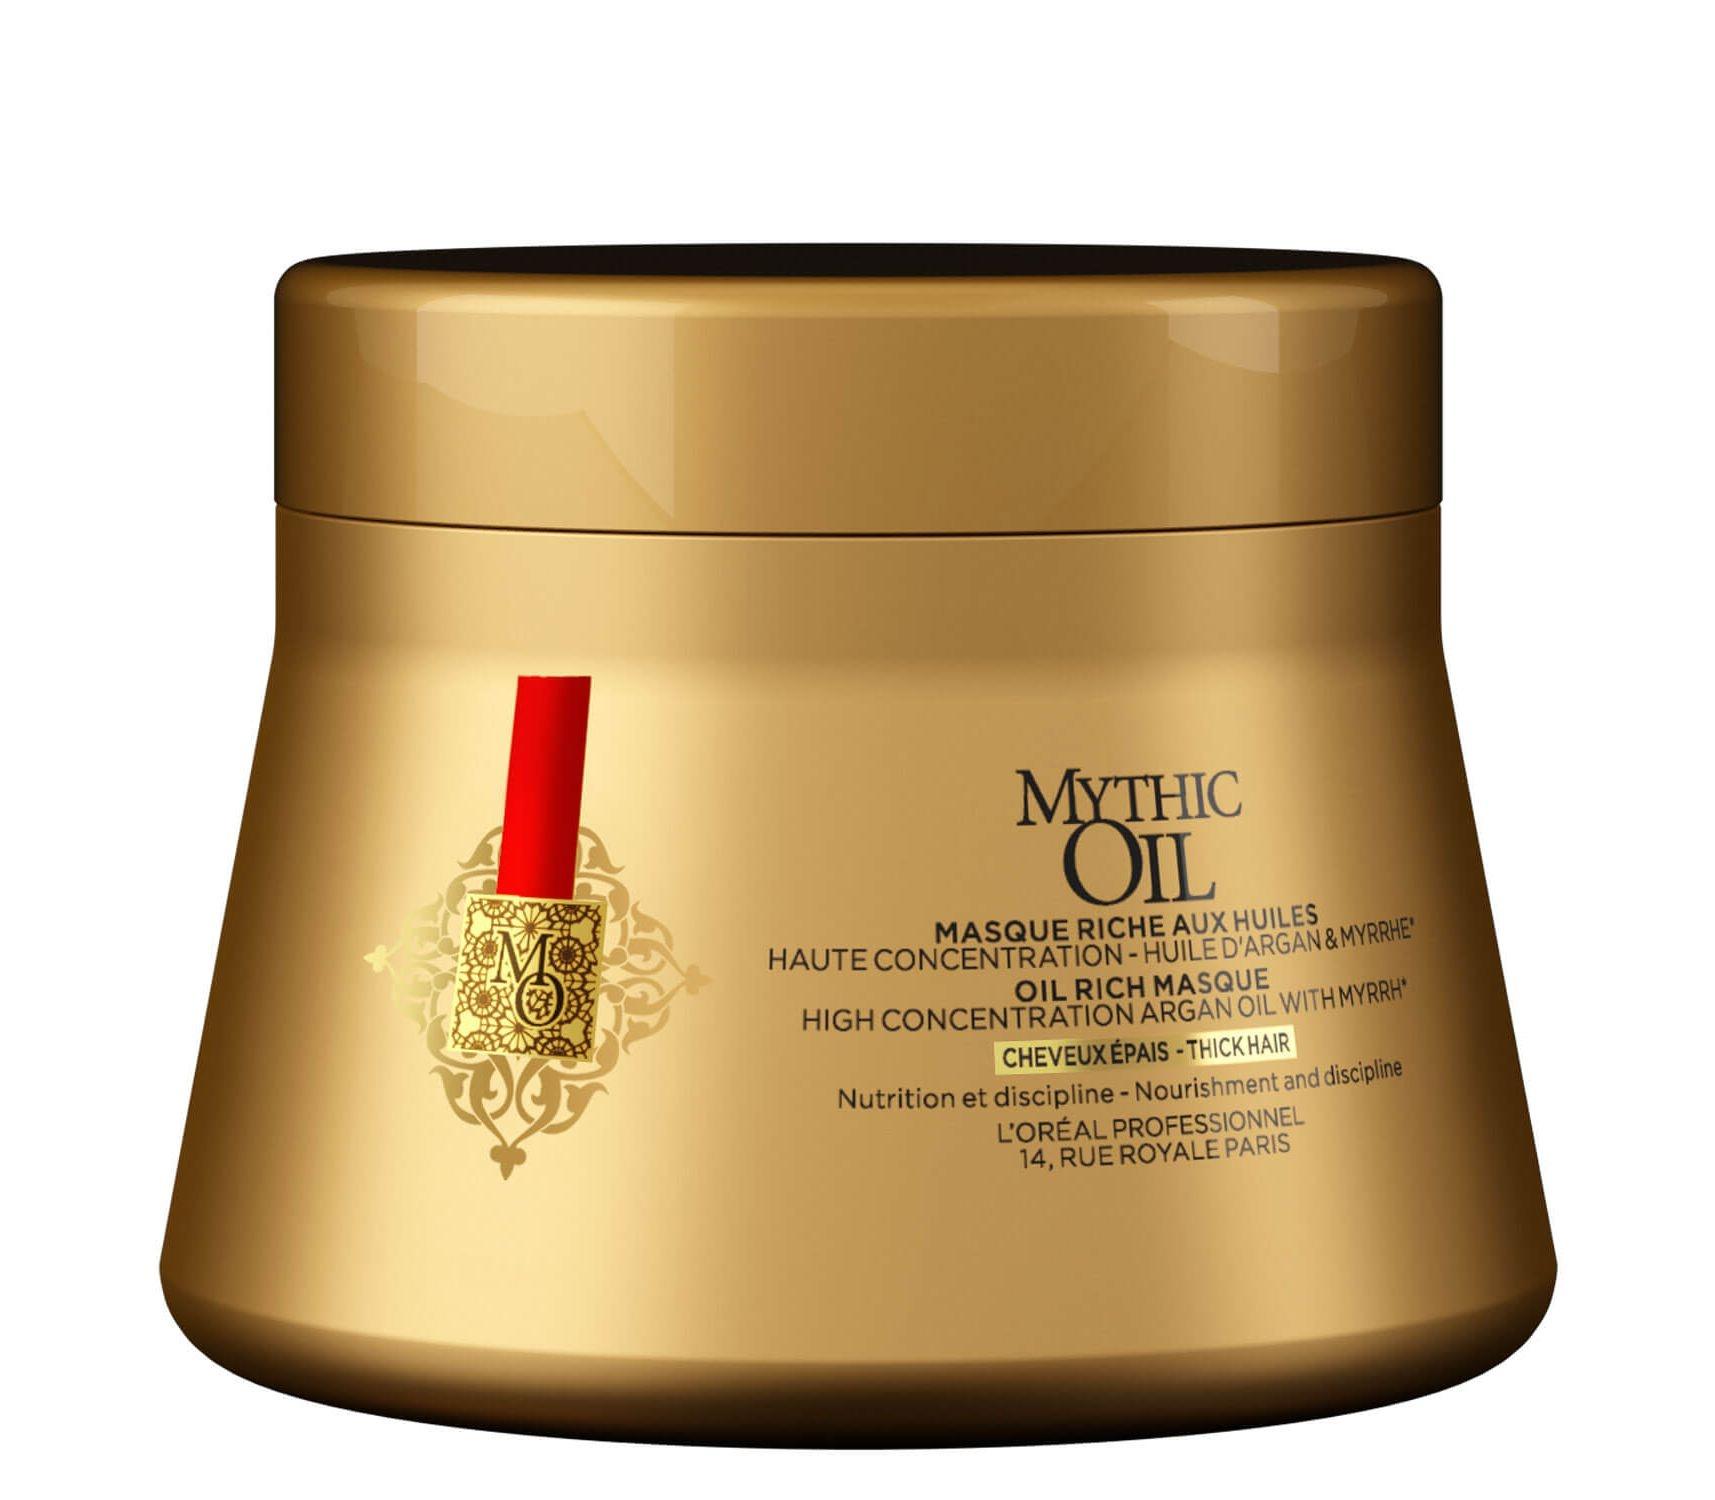 L'Oreal Professionnel Маска Mythic Oil для Плотности Волос, 200 мл